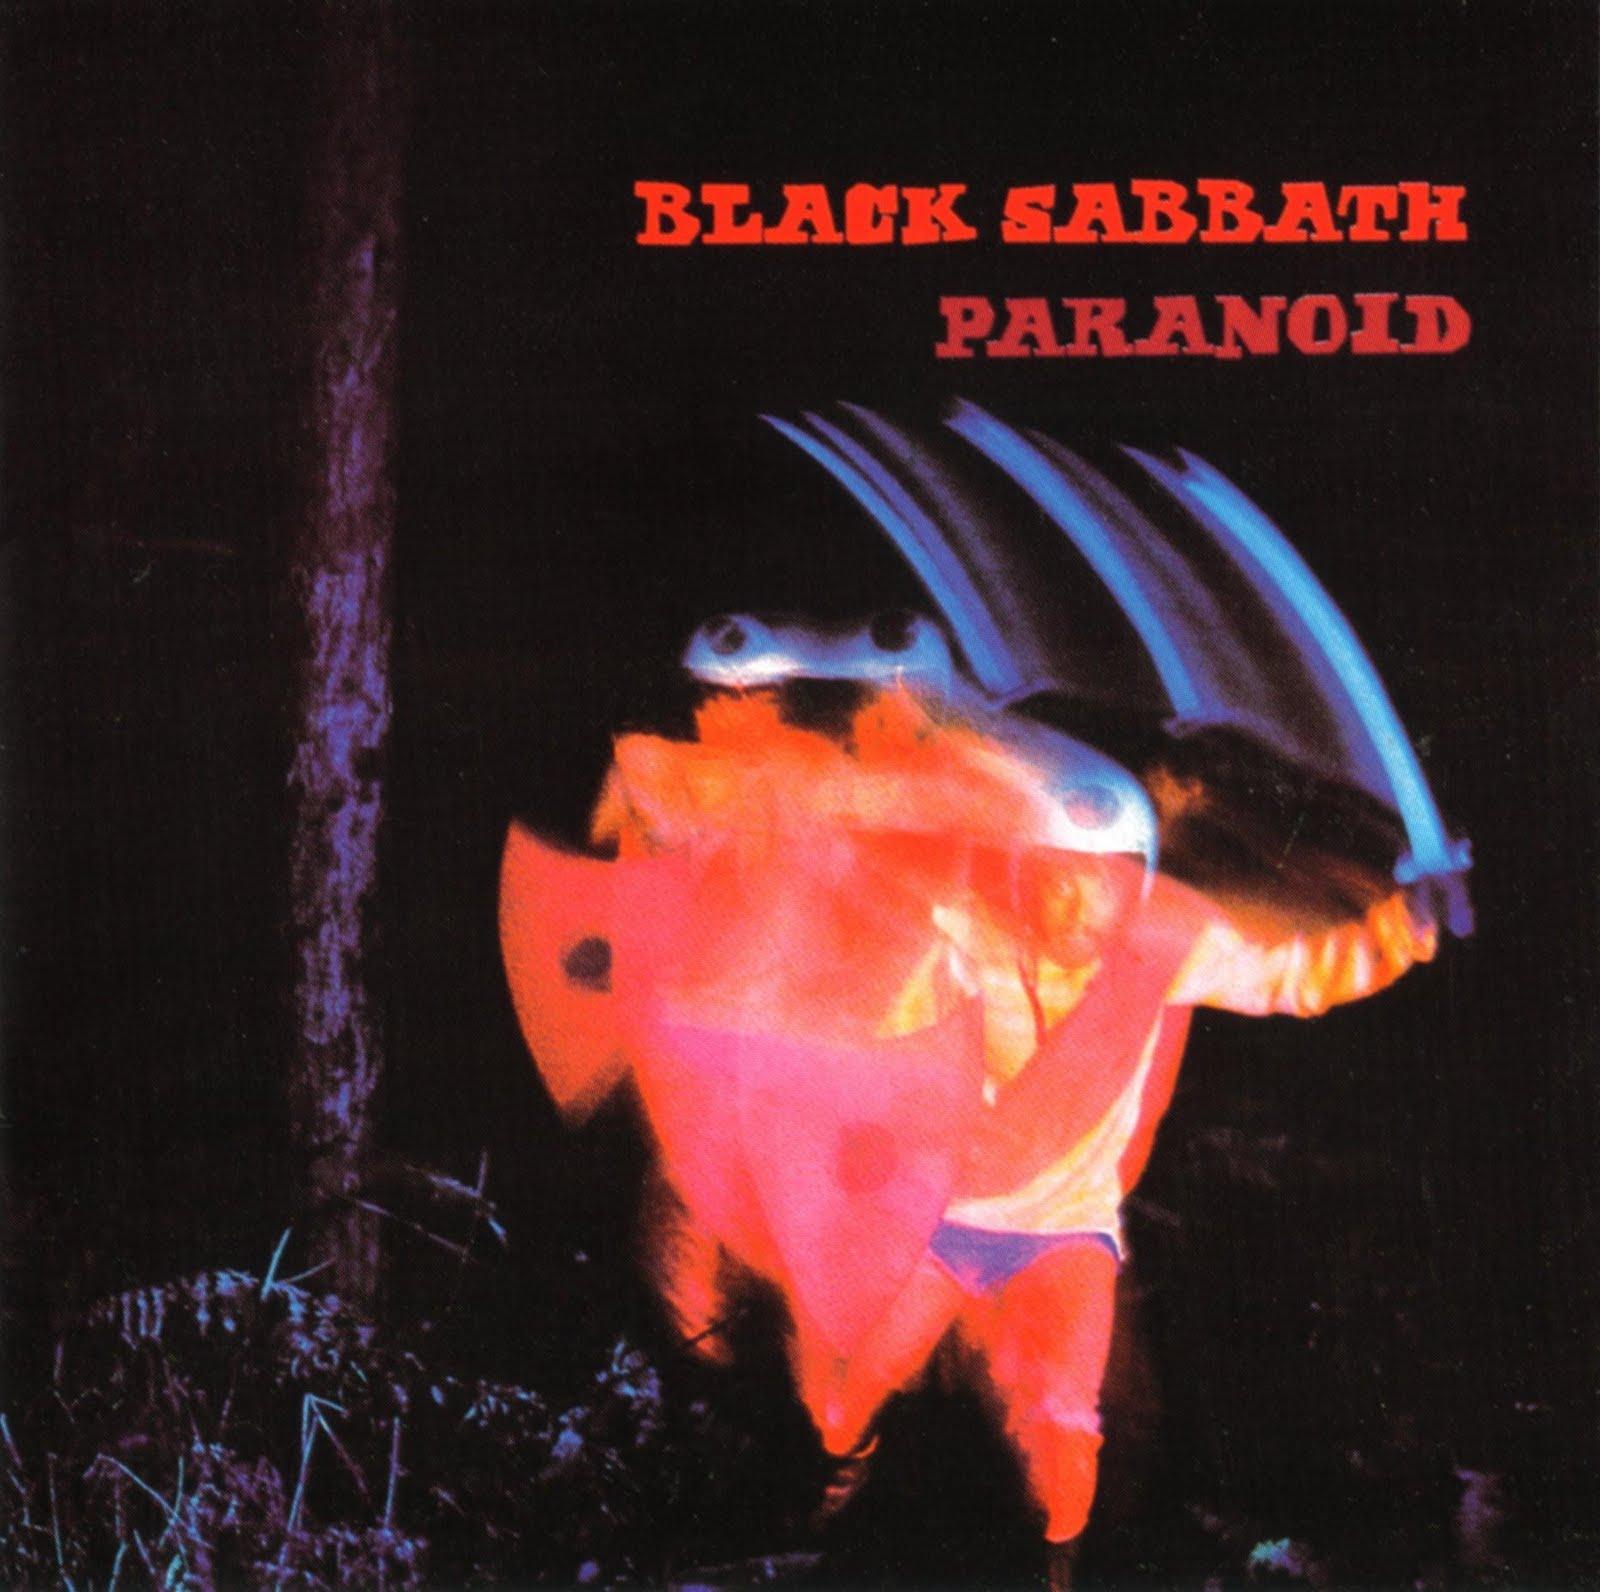 185. Black Sabbath – Paranoid